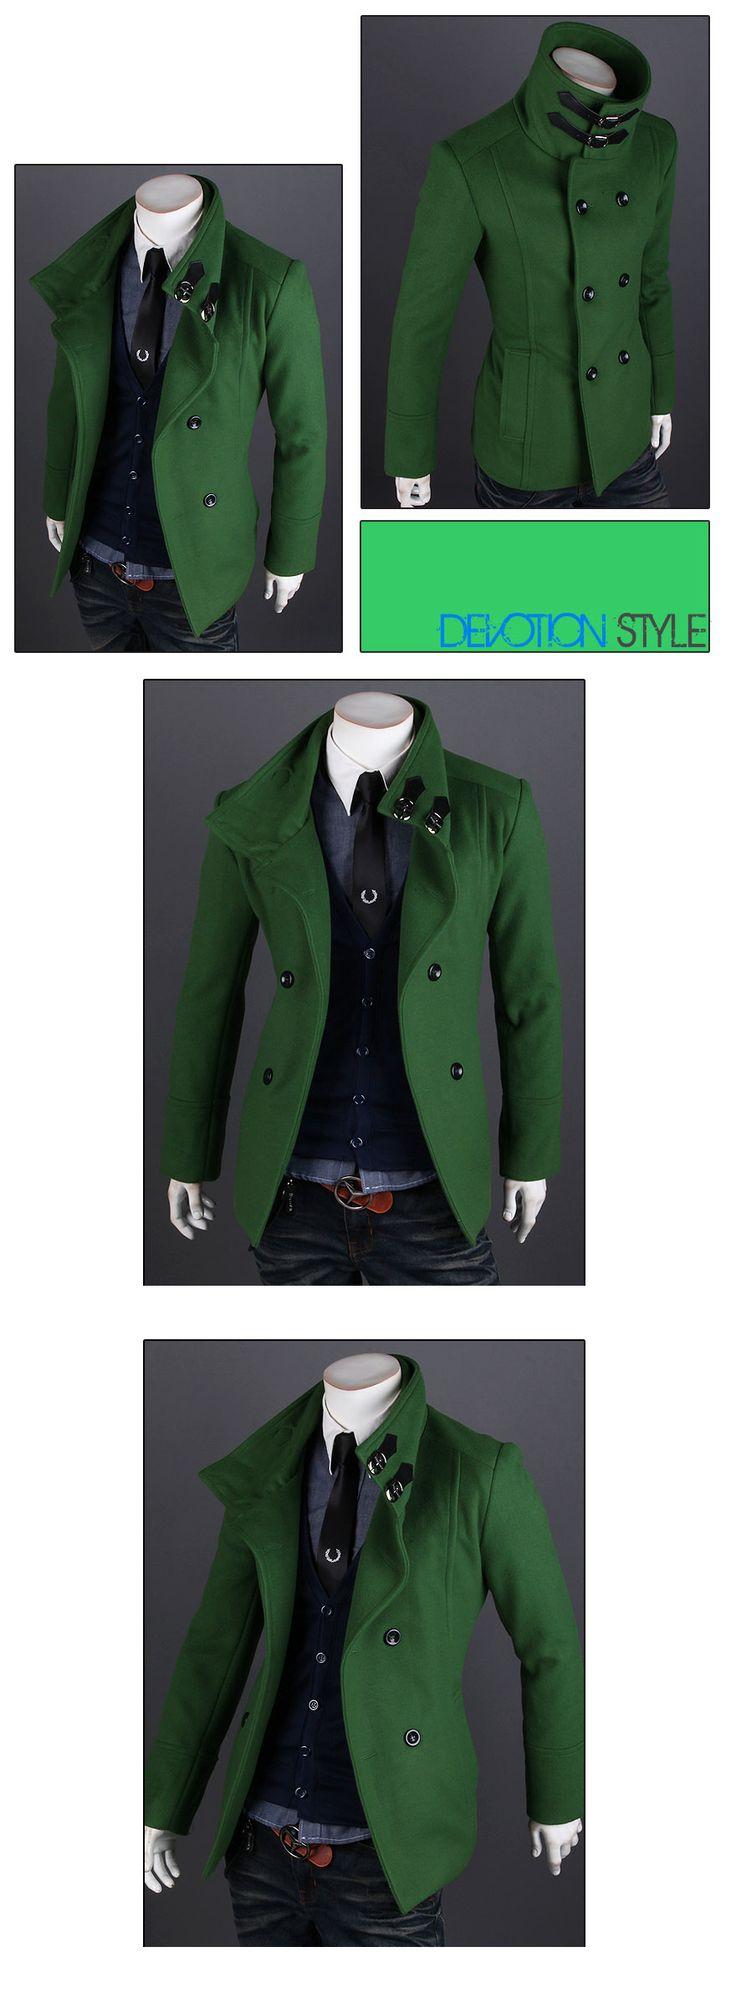 2013 New Arrival Winter Men's Double breasted Overcoat Single breasted Coat Short Design Woolen Wind Coat Men Slim Outerwear-inWool & Blends...